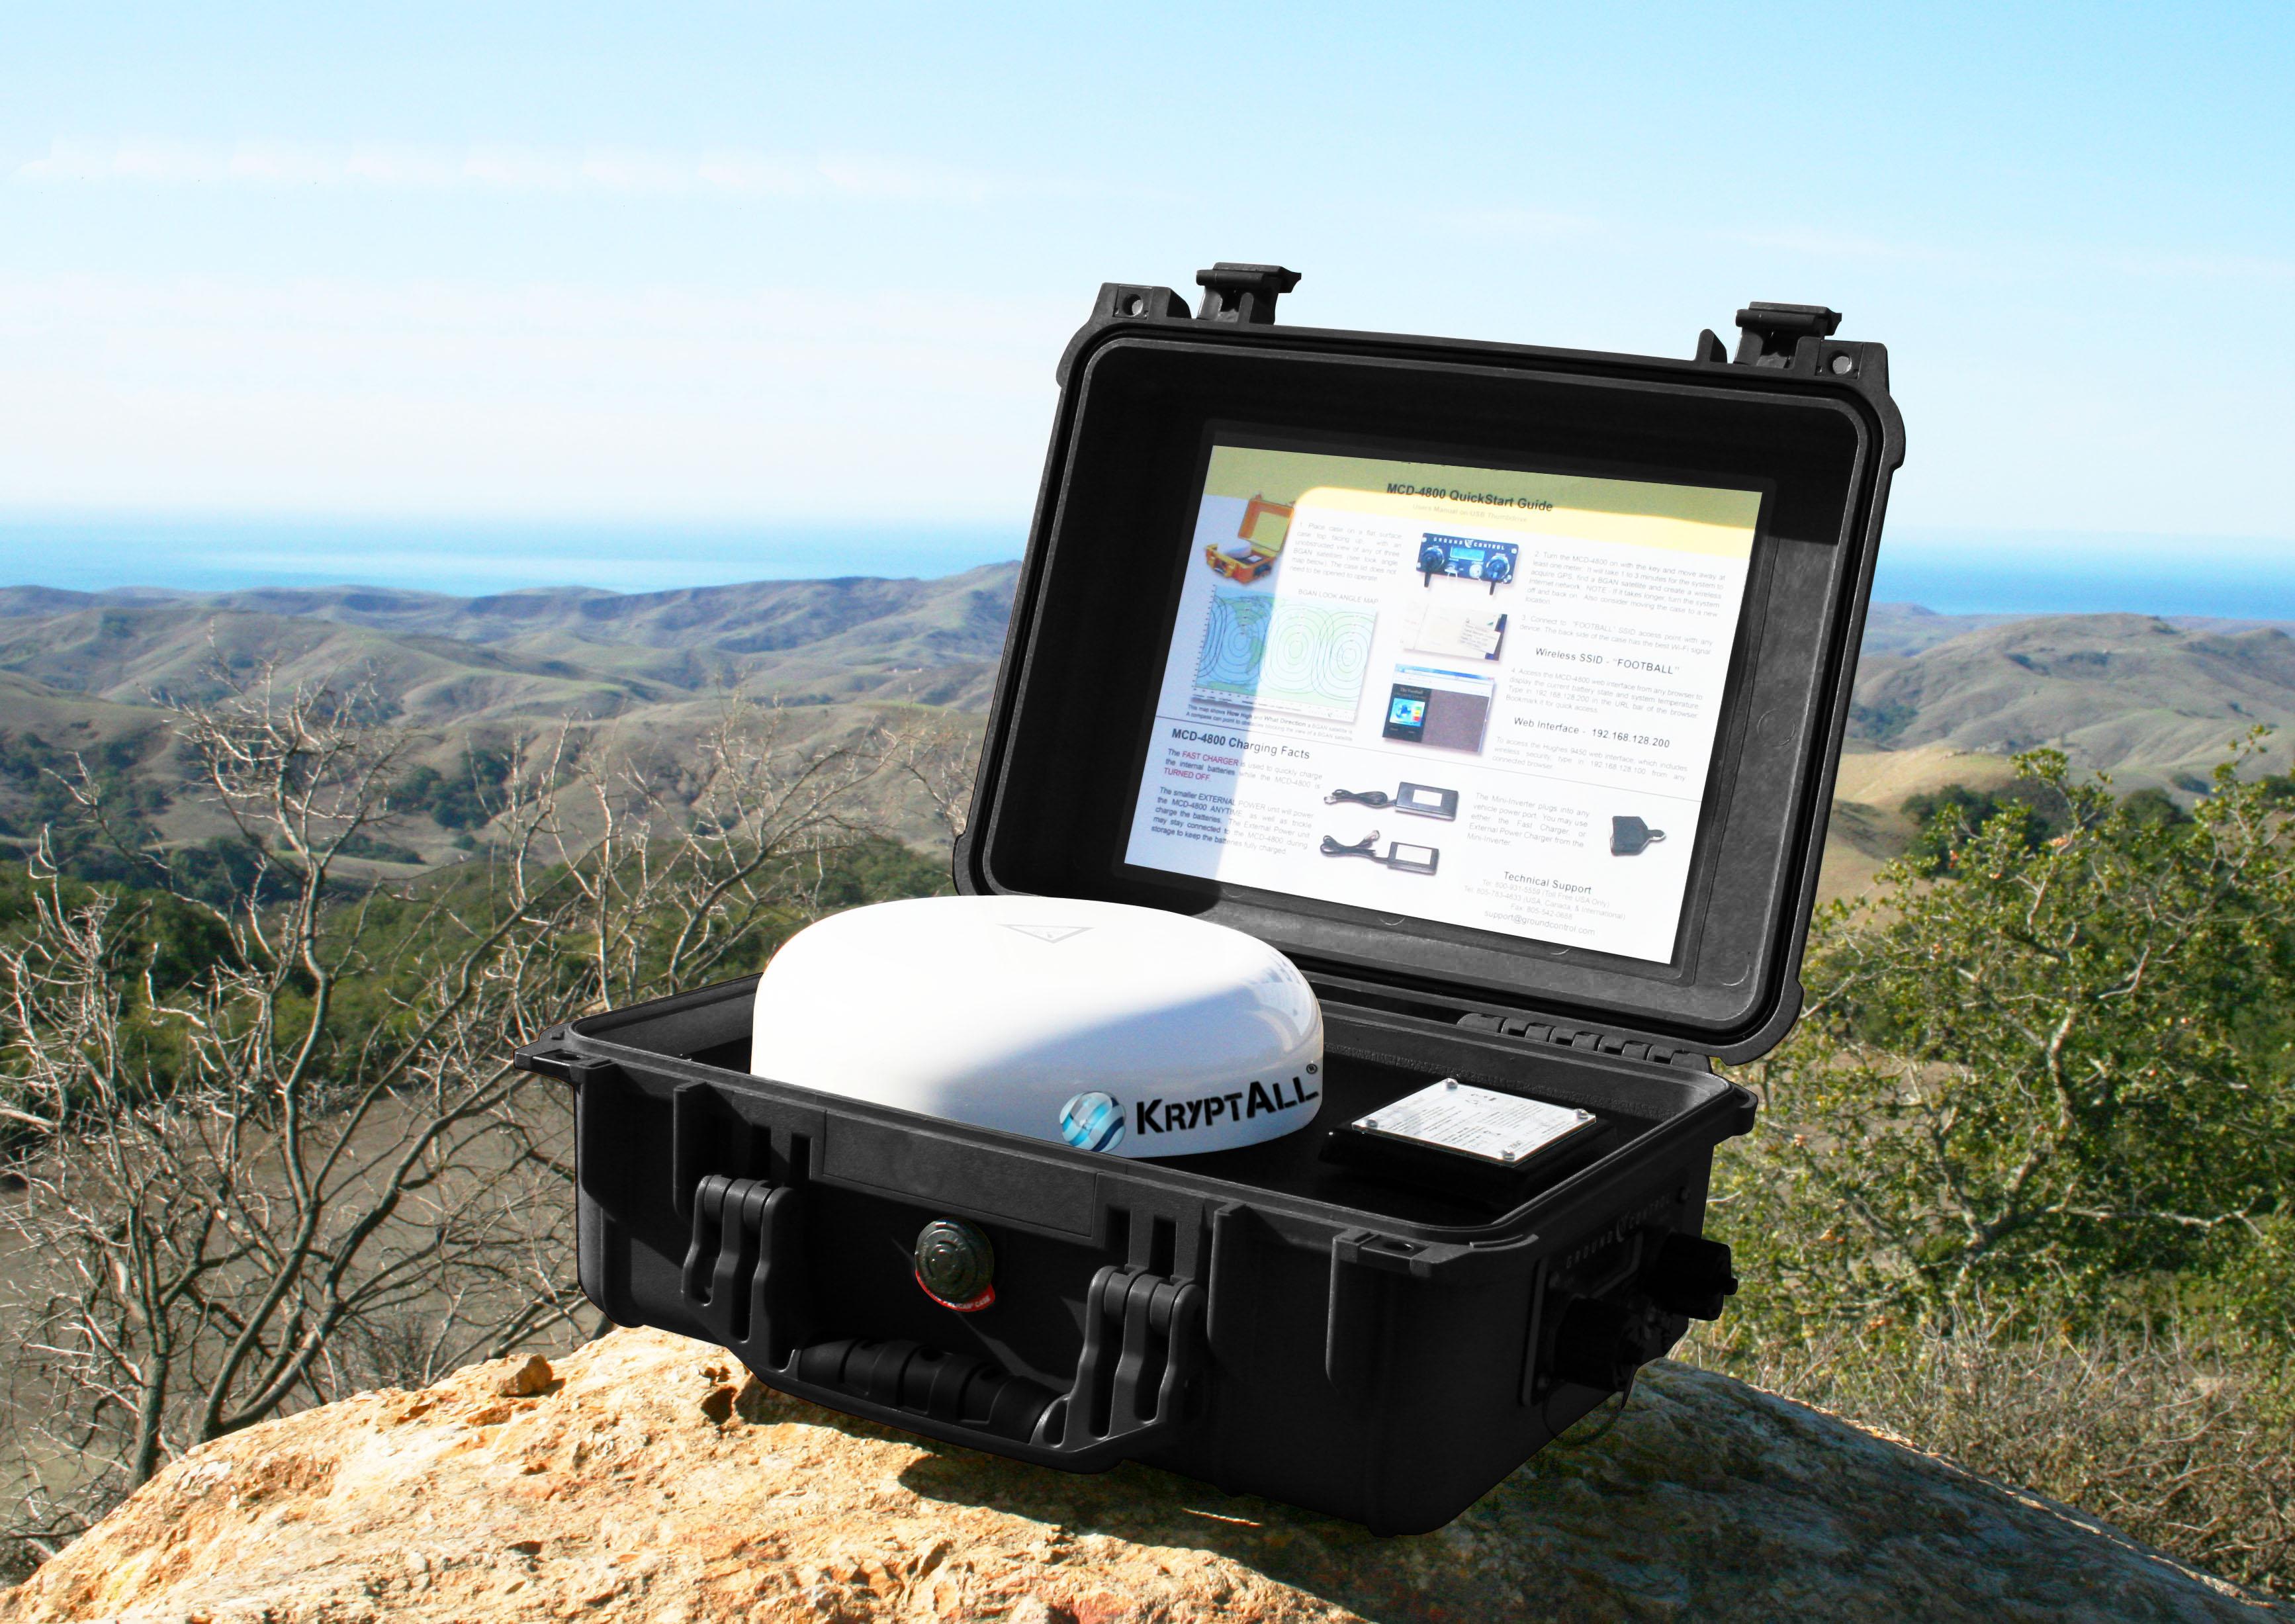 KryptAll Provides Secure Satellite Calling